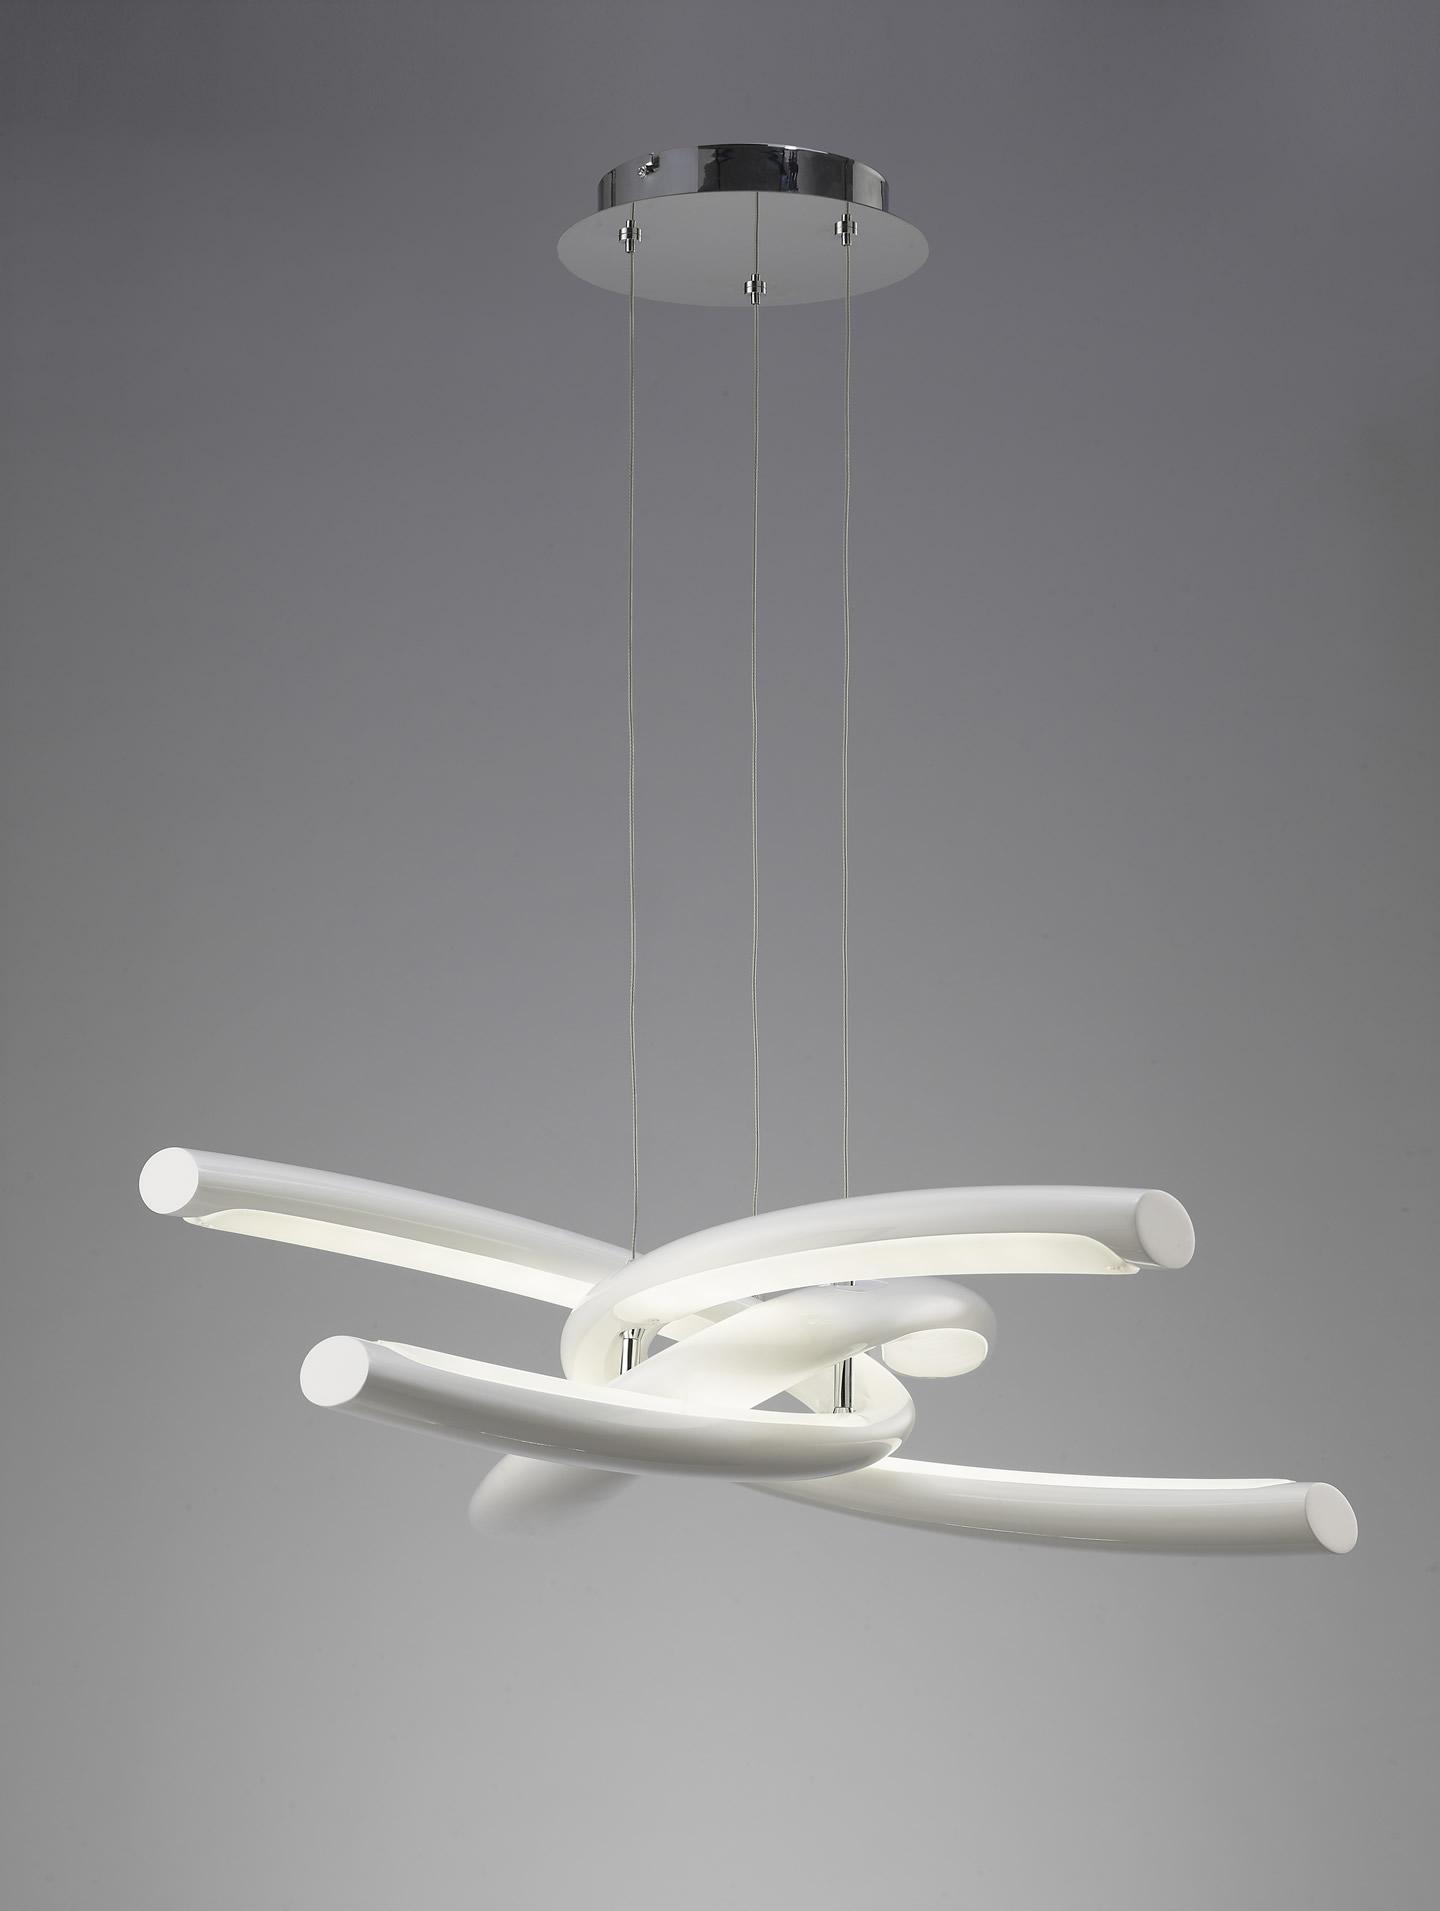 Knot Lámpara 6L LED 48w Cromo + blanco